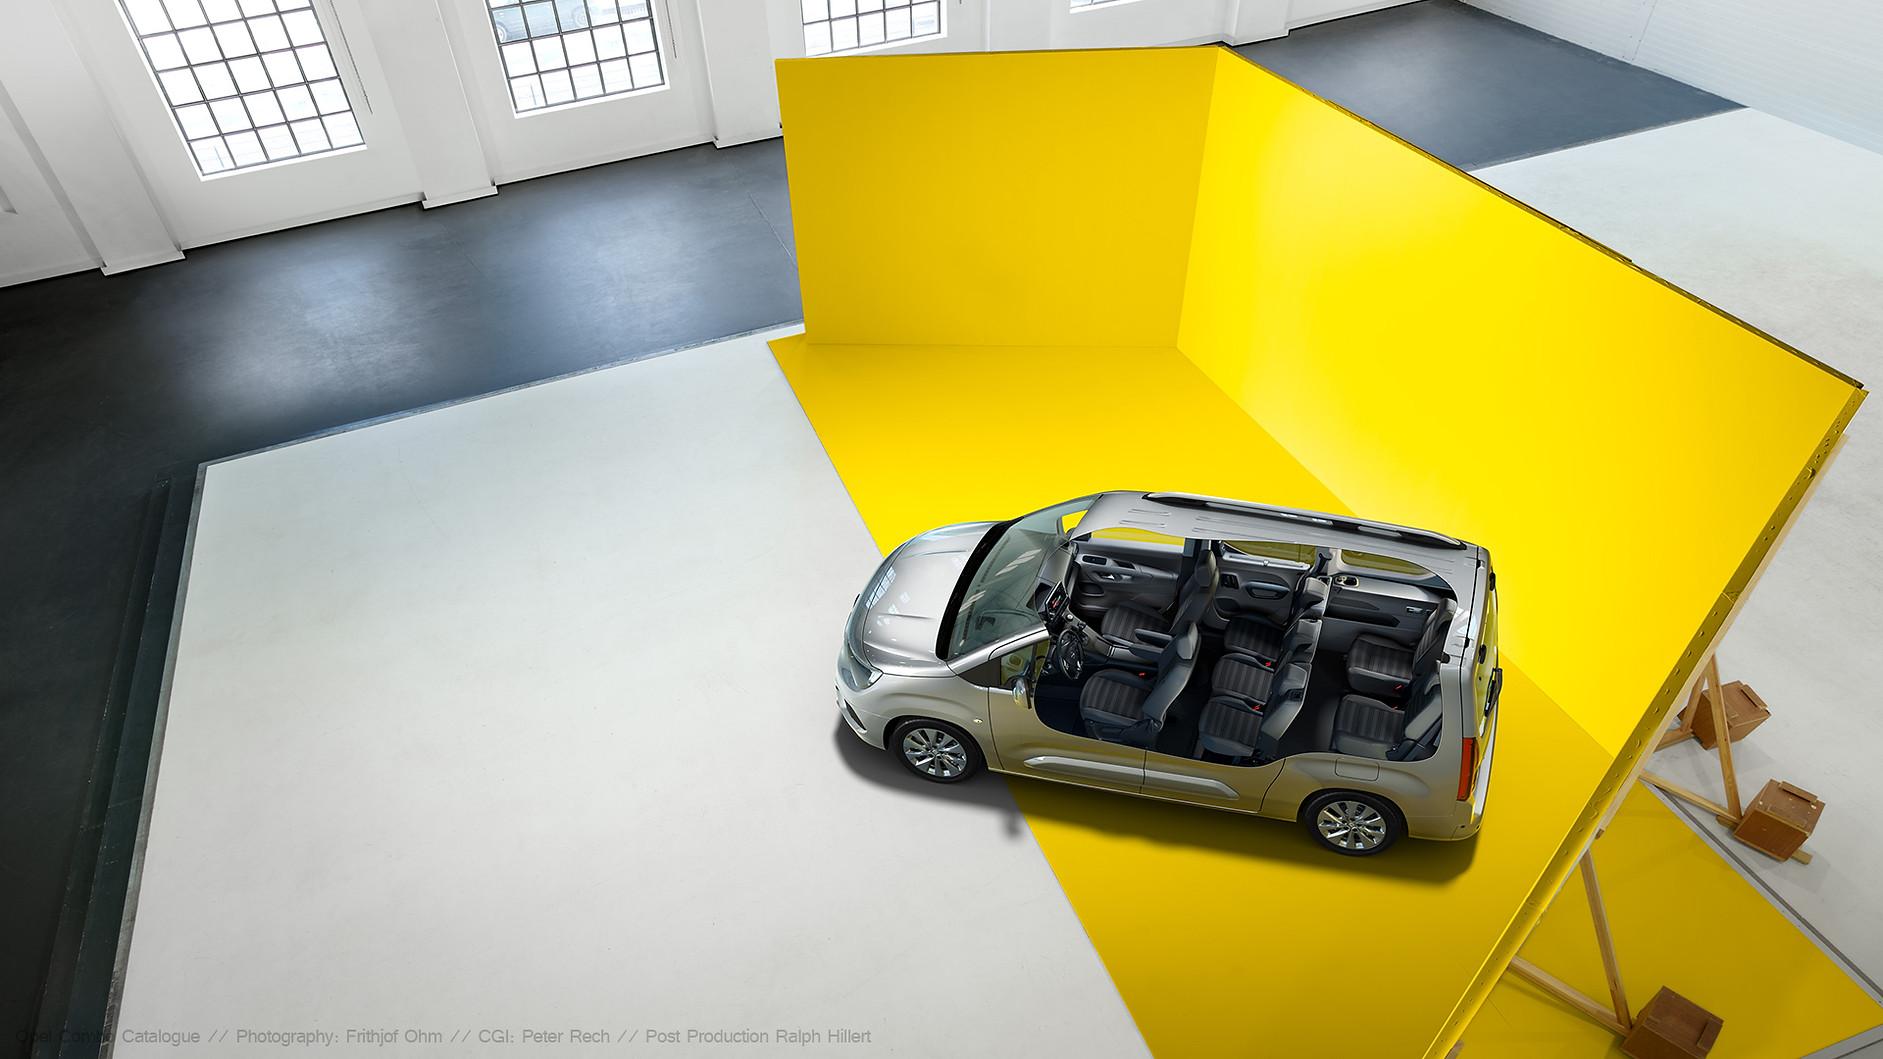 Opel_Combo_Katalog_05.jpg